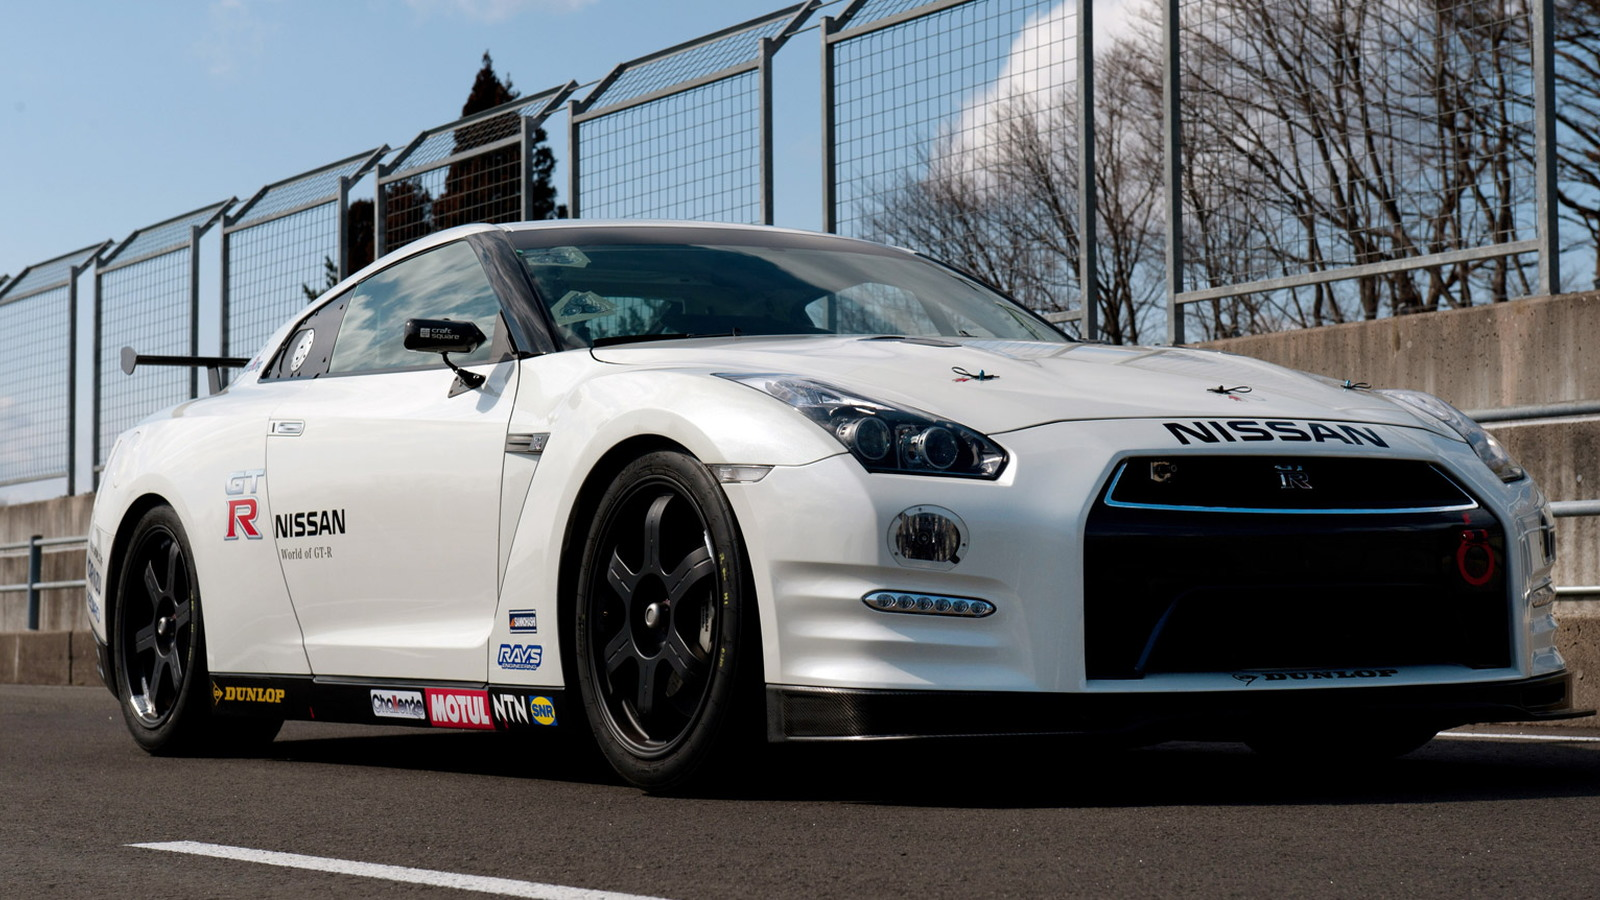 2013 Nissan GT-R (Club Track Edition) entering Nürburgring 24 Hours